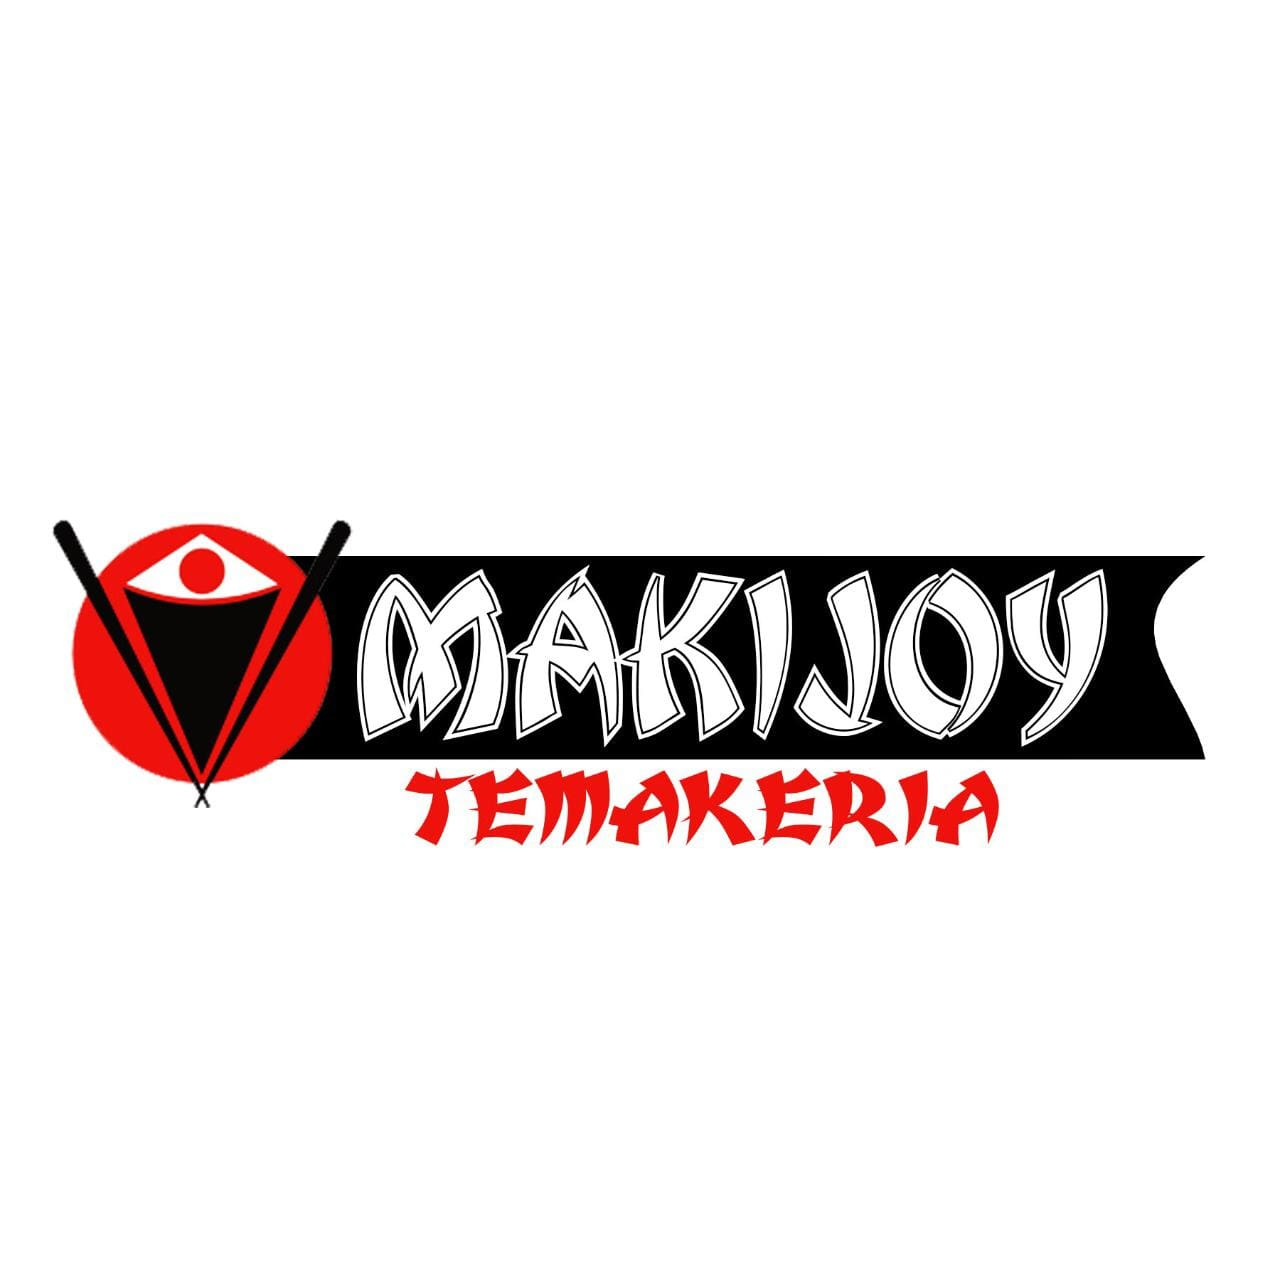 Makijoy Temakeria